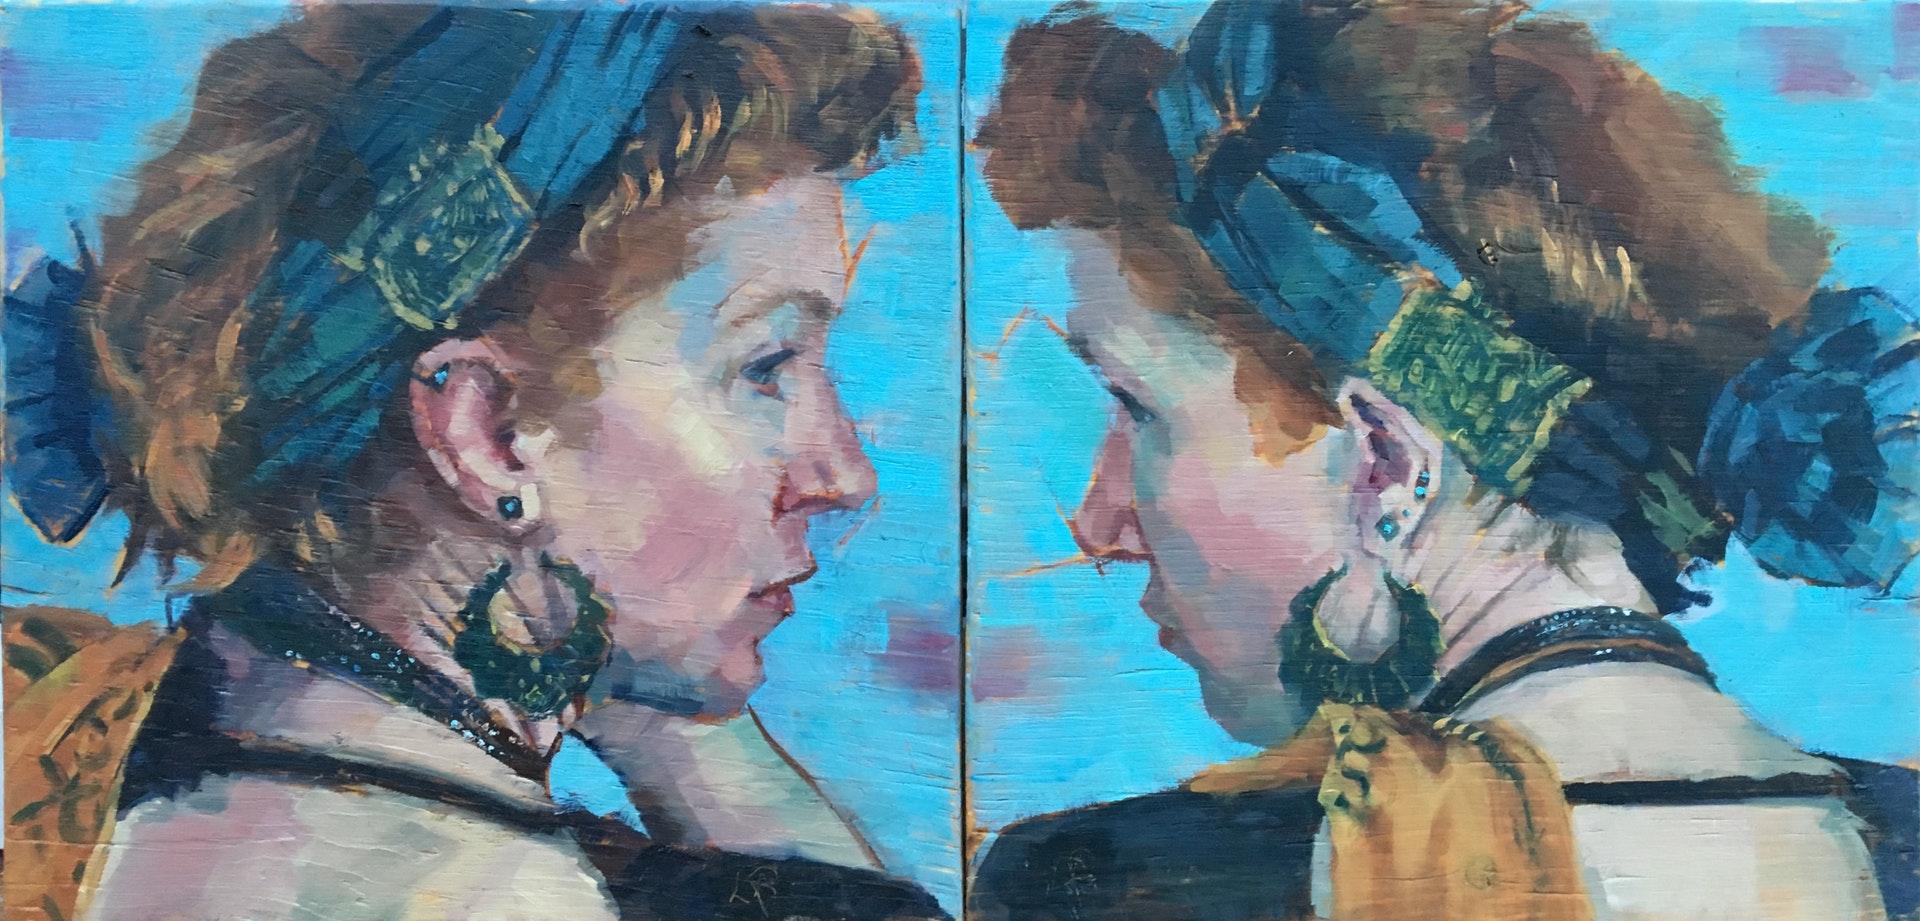 Lisa Puhlhofer  Duality (diptych)  Oil on board, 22.5 x 45 x 1 cm  http://lisaanpuhlhofer.net